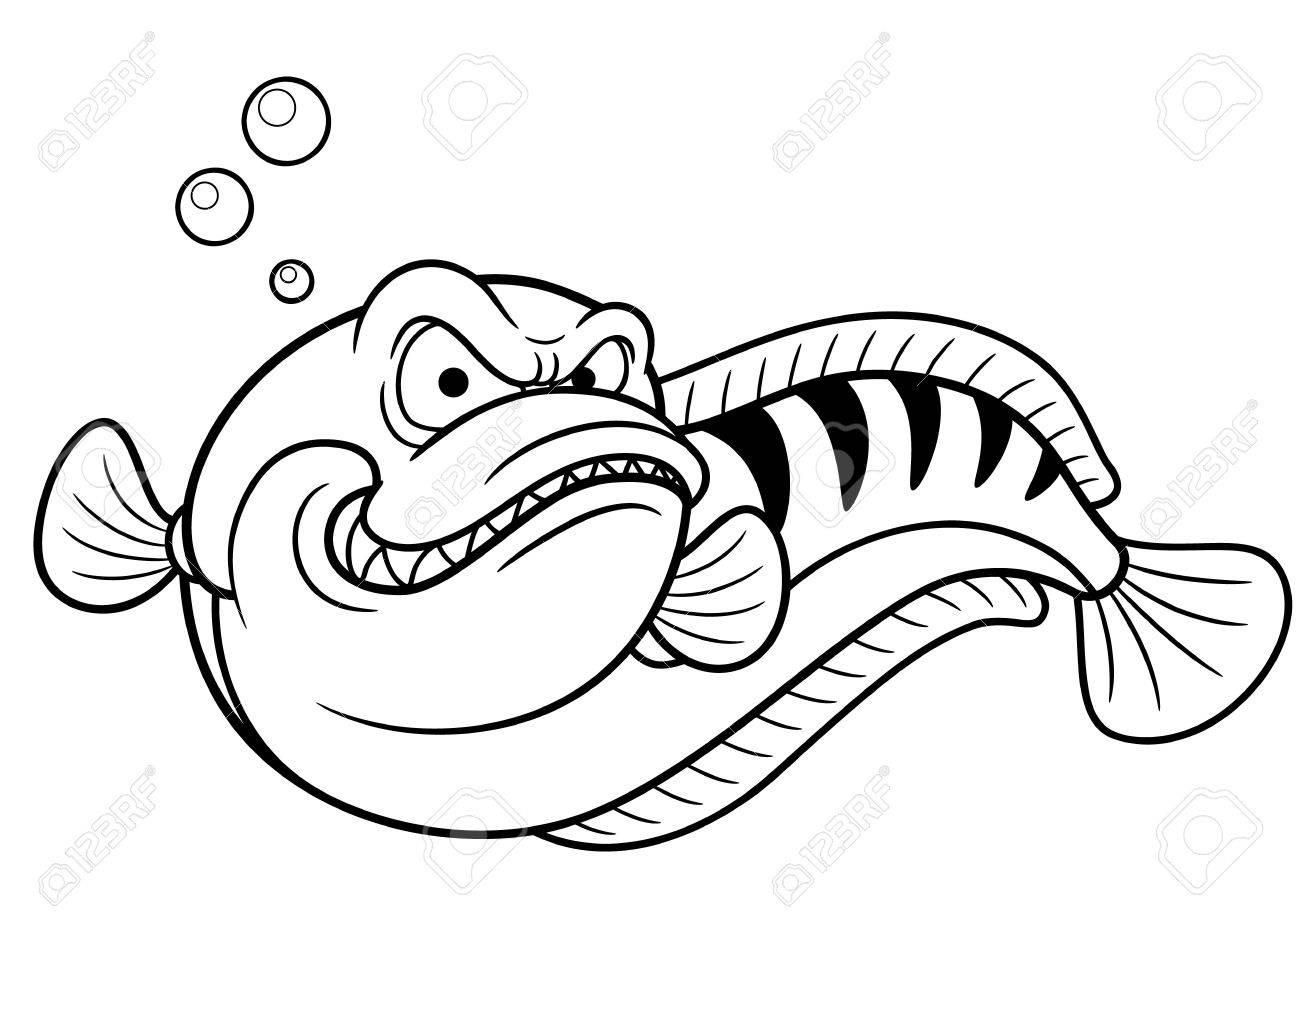 Vector Illustration Of Giant Snakehead Fish